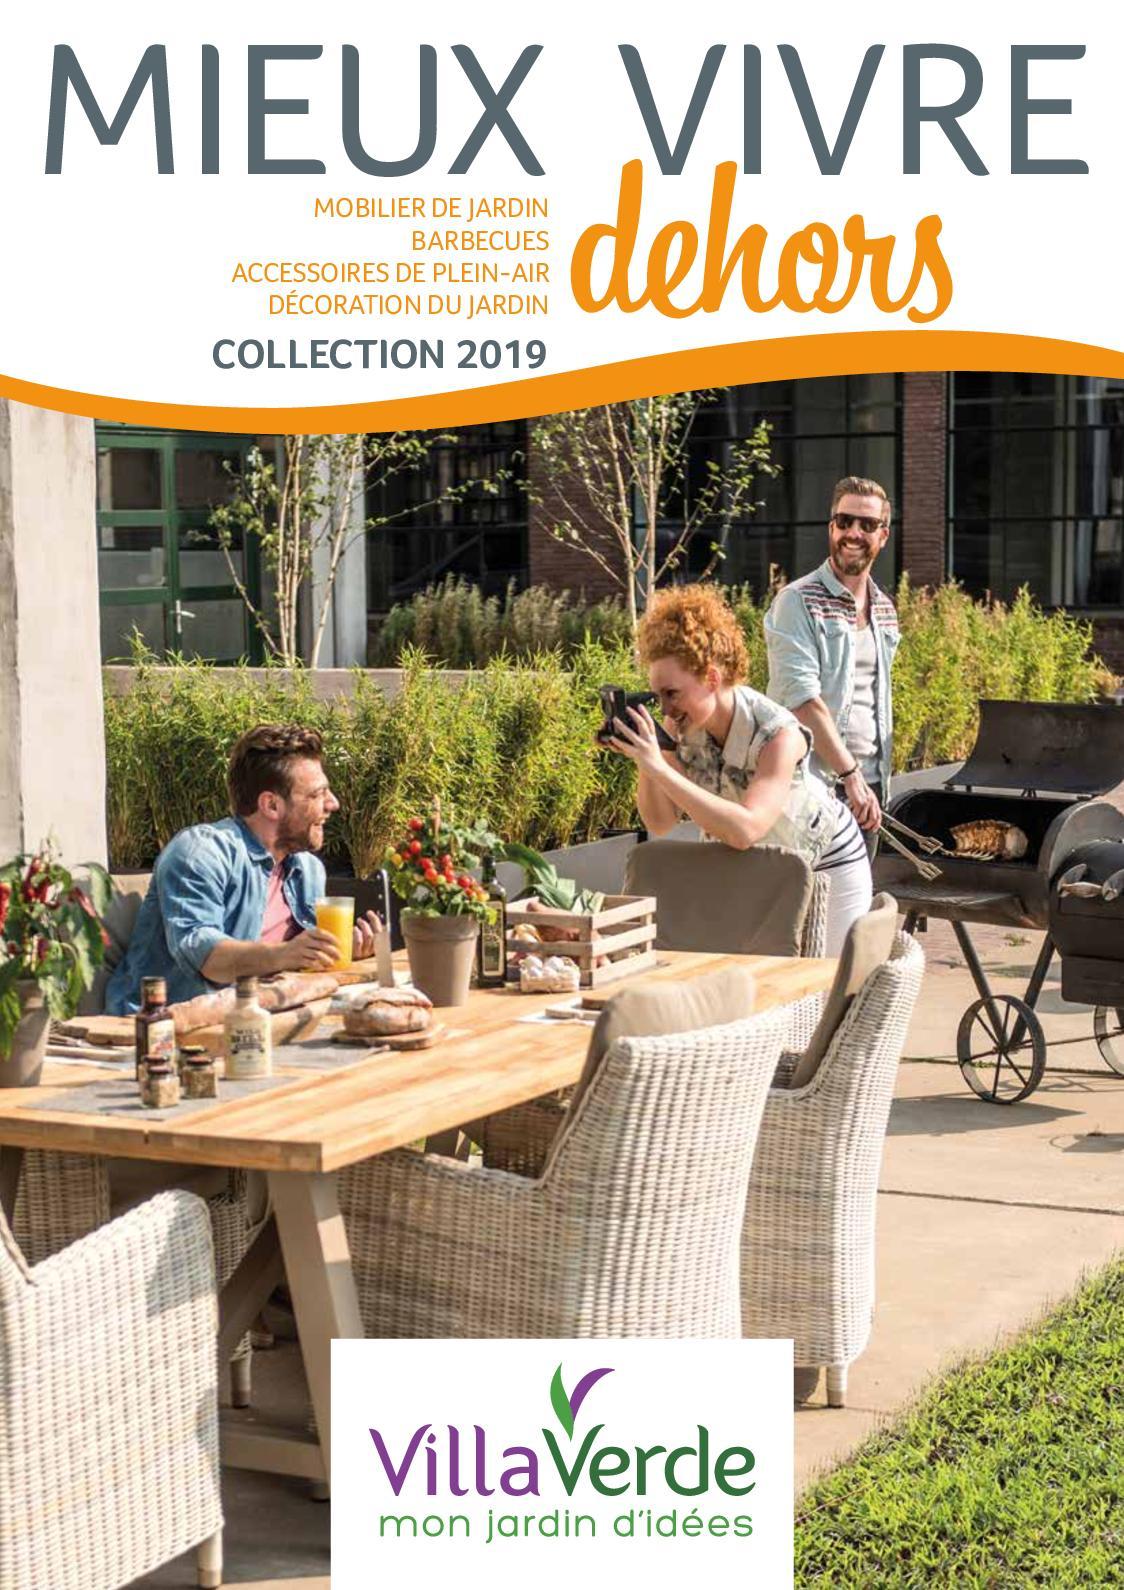 Calaméo - Villaverde Catalogue Mobilier De Jardin 2019 destiné Salon De Jardin Villaverde